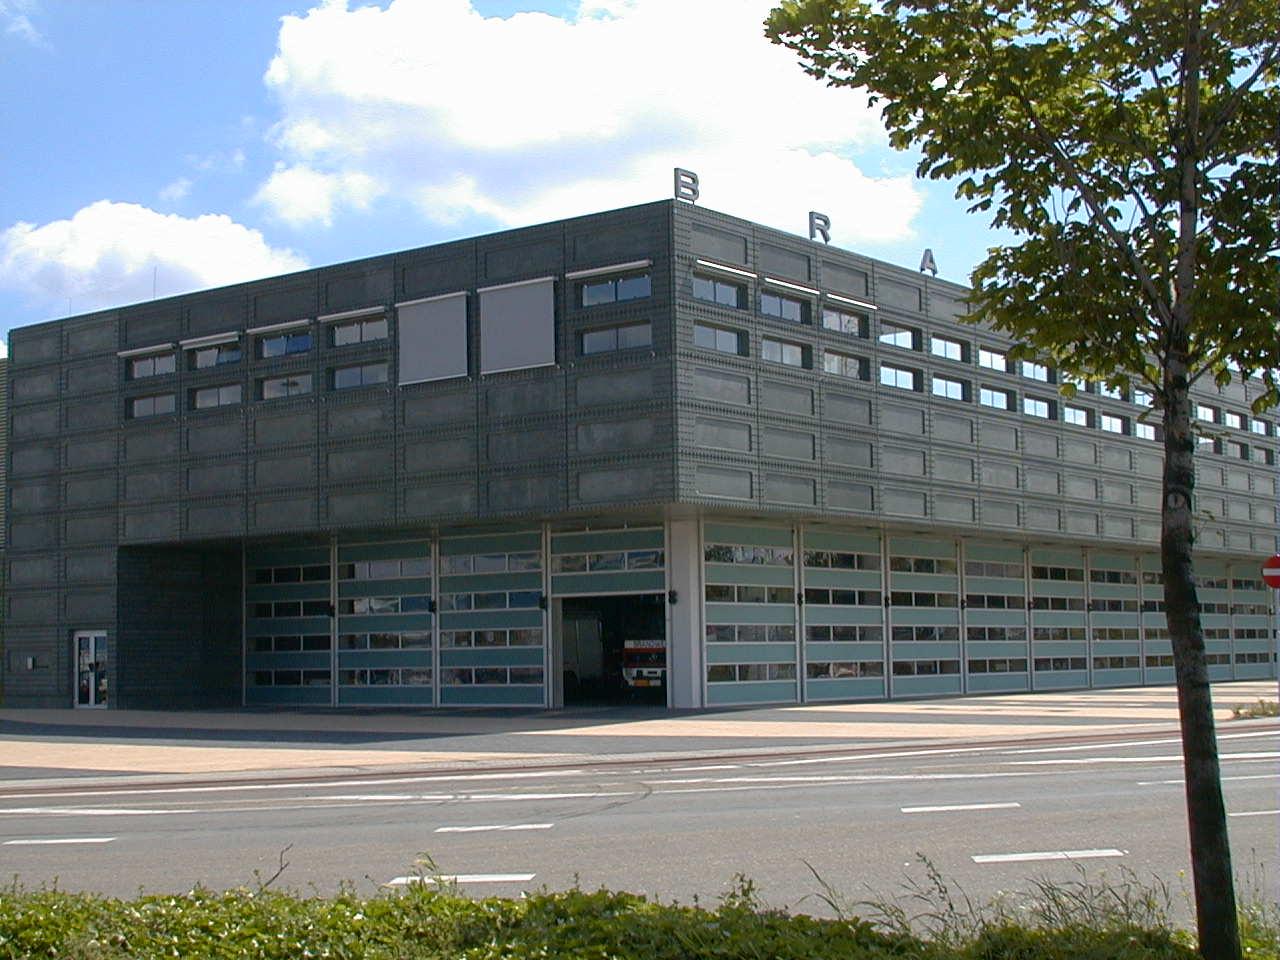 Brandweer, Maastricht